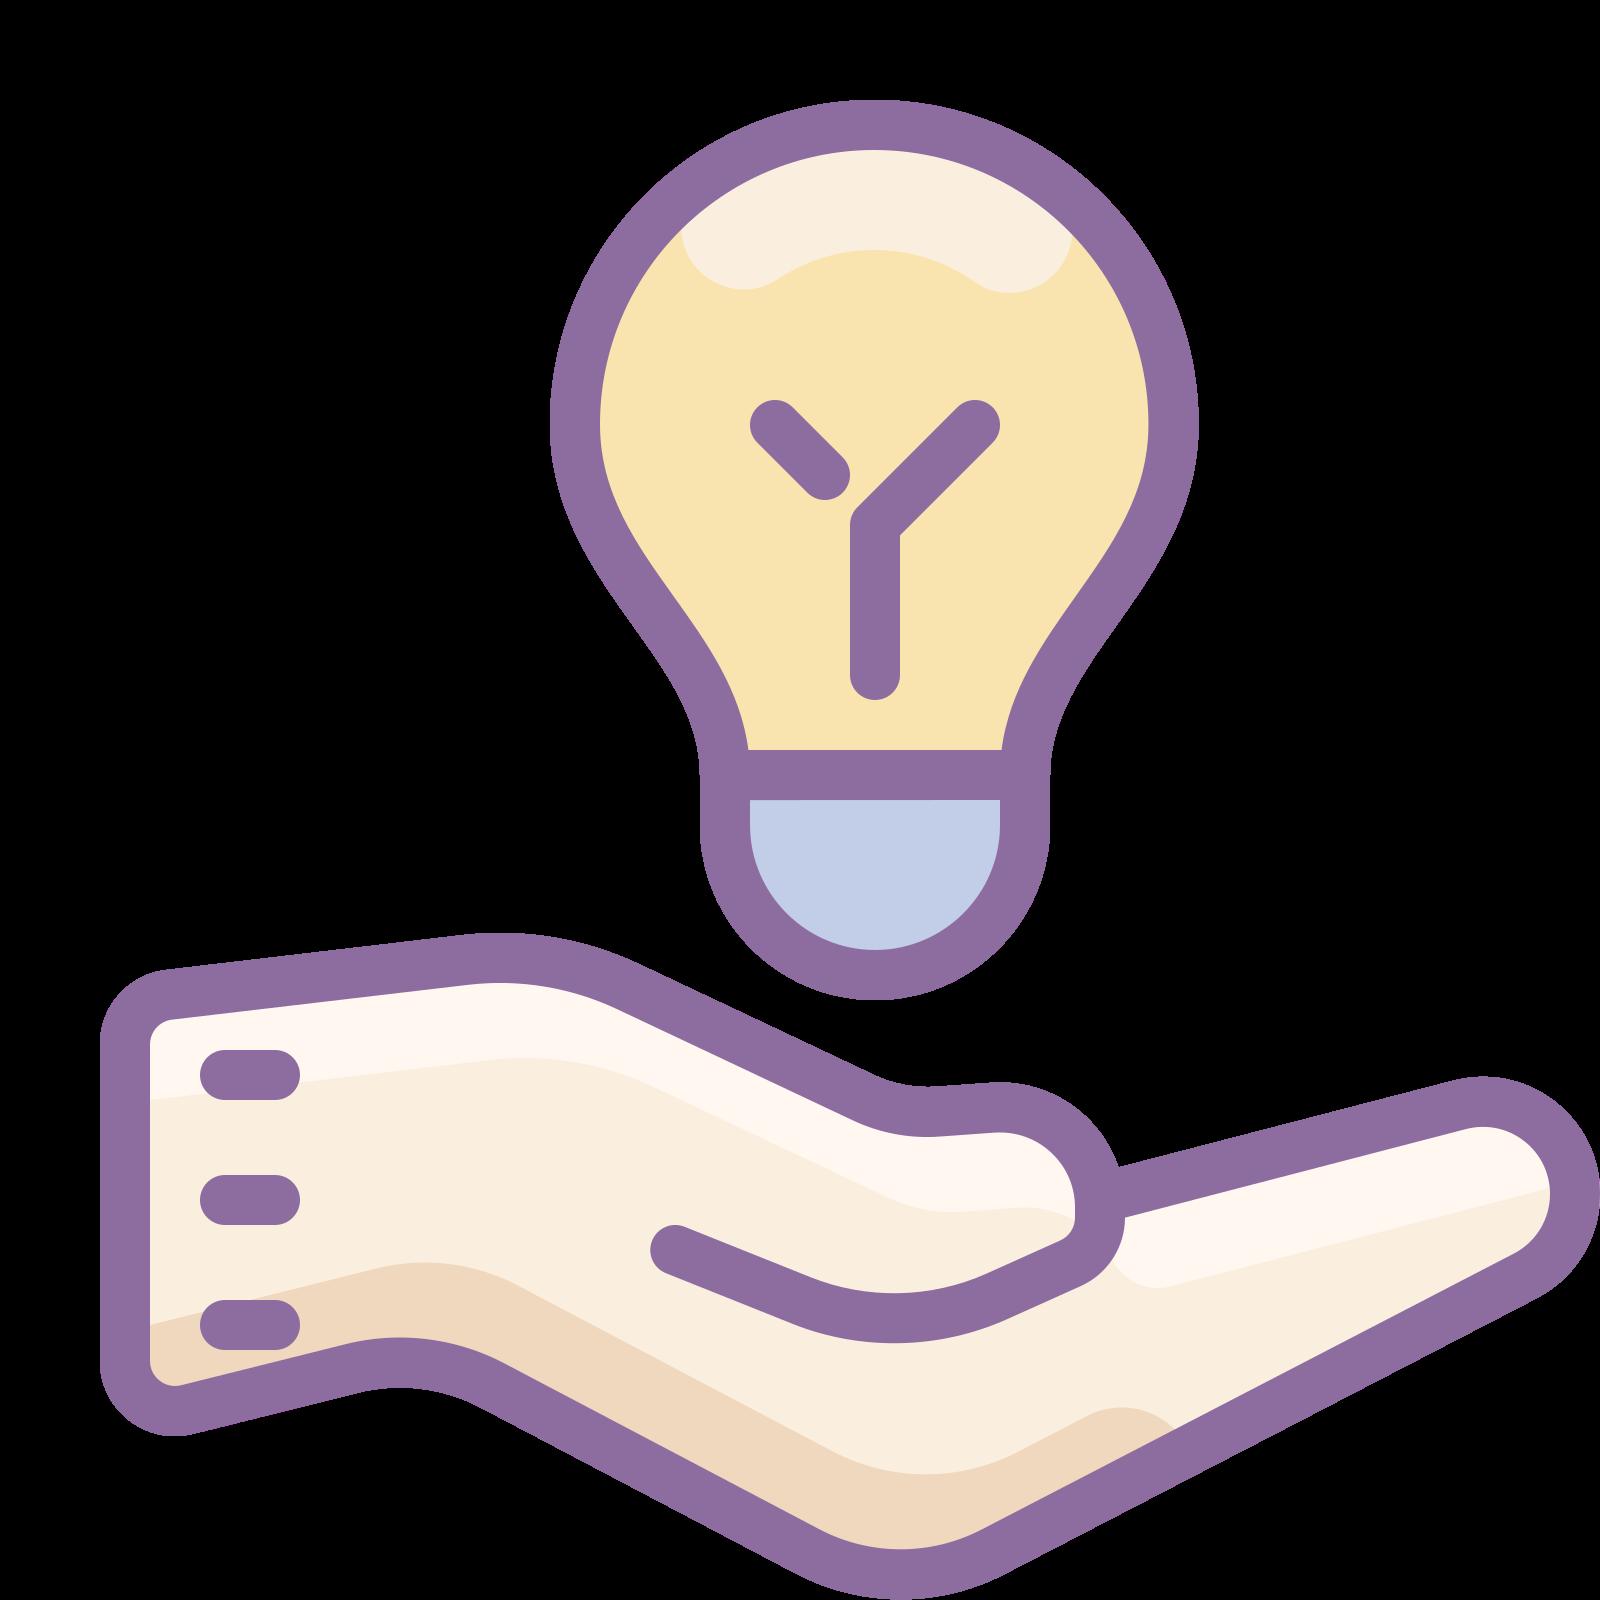 Обмен идеями icon